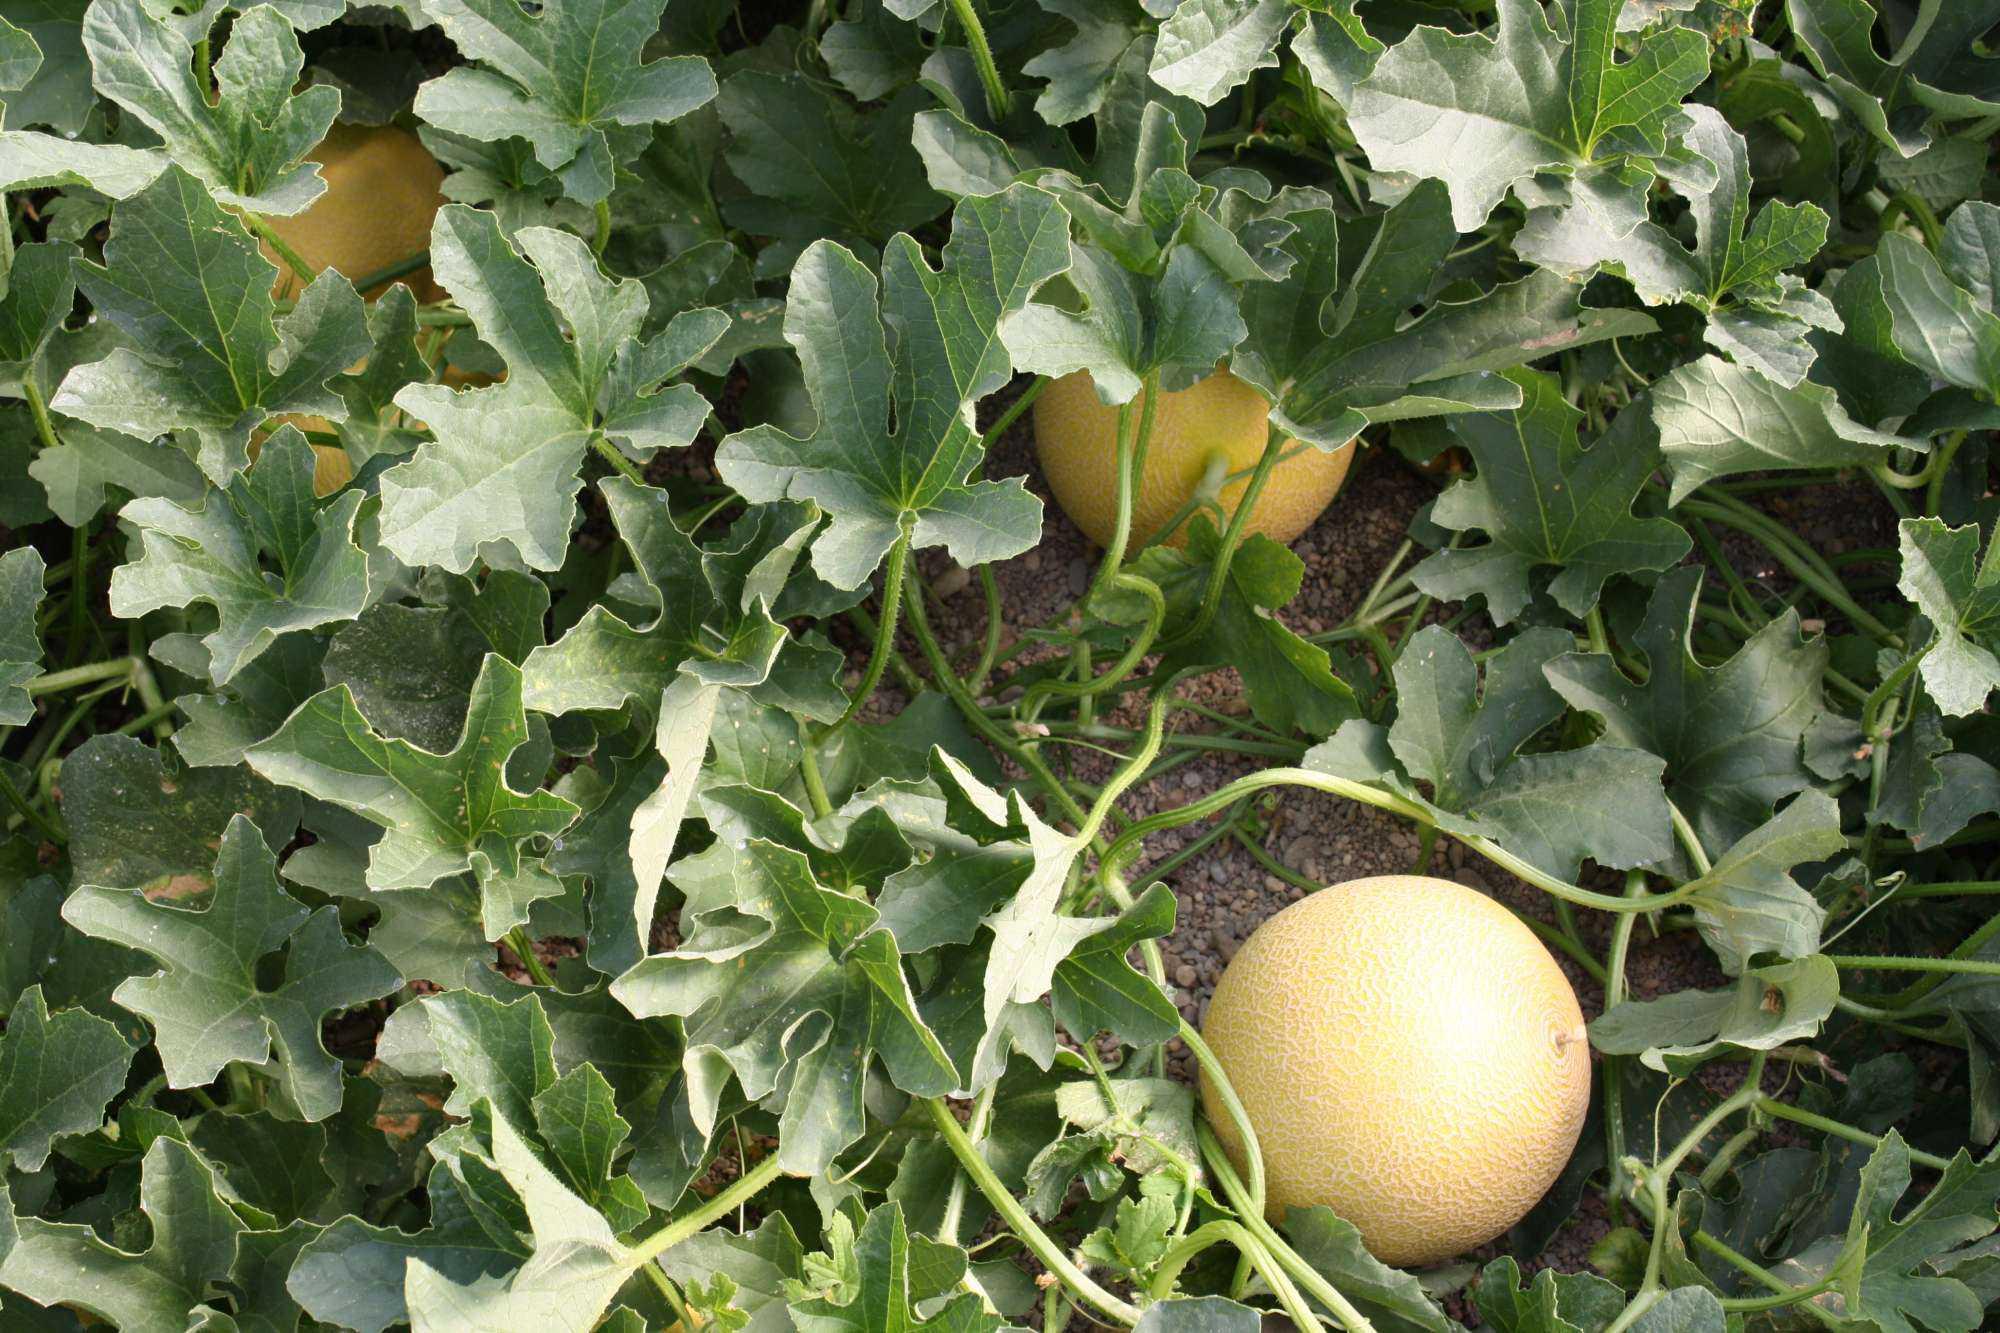 Melon Genome Study Discloses Impacts Of Breeding